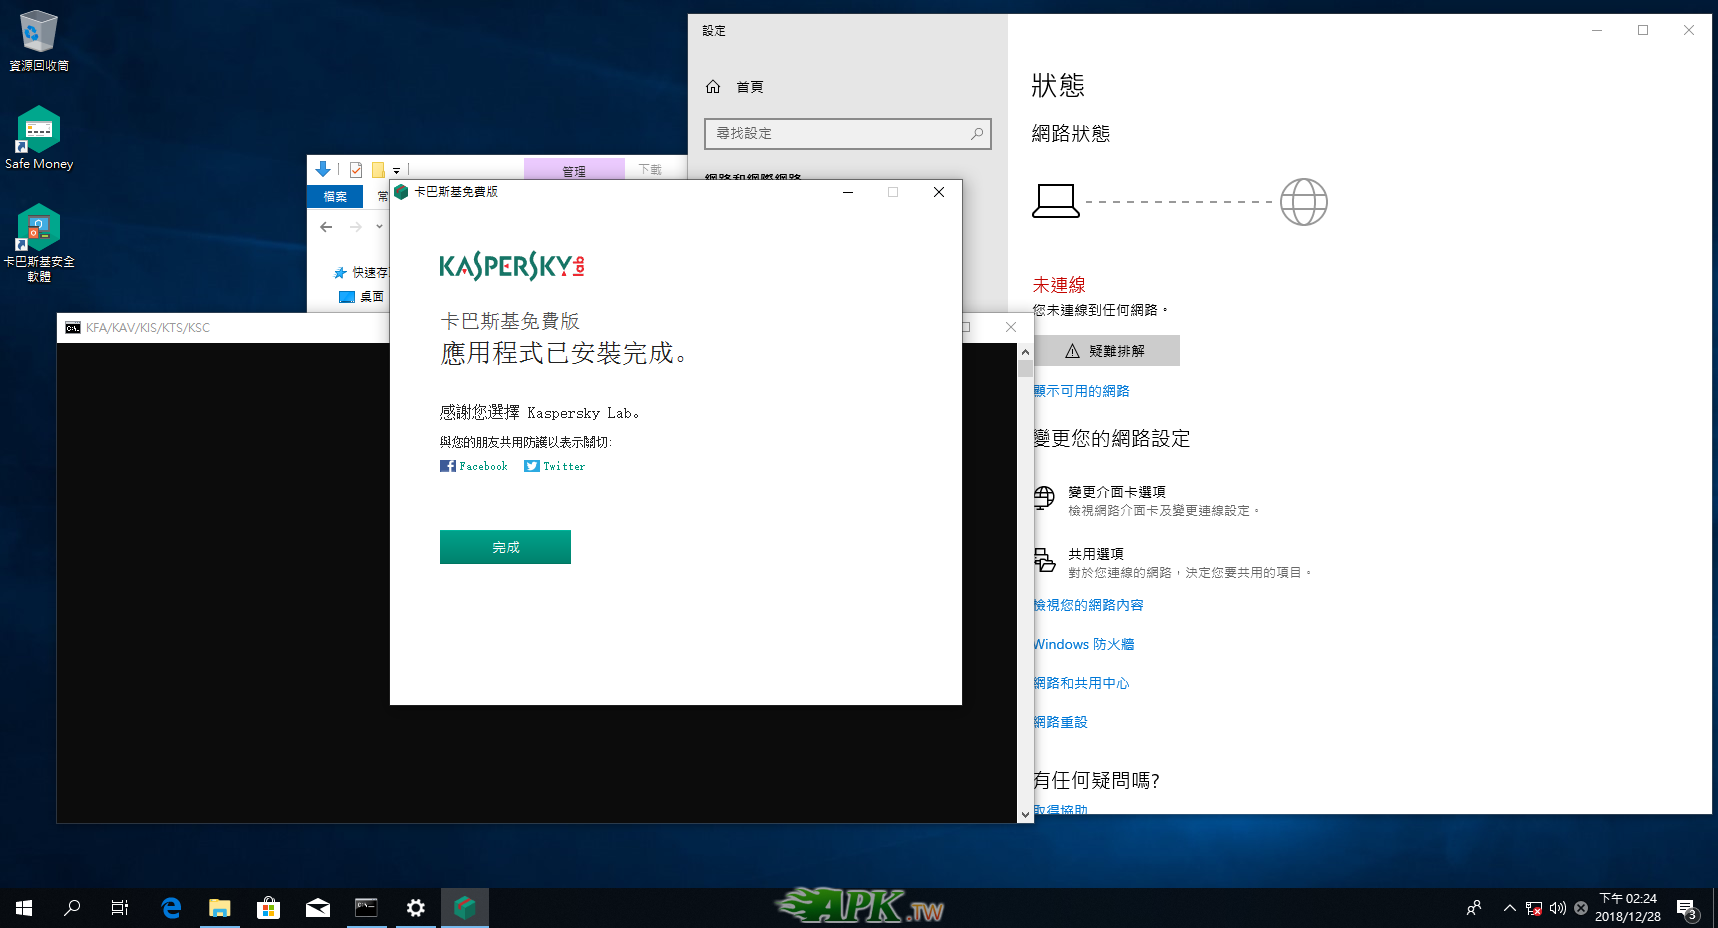 Windows 10-2018-12-28-14-24-46.png